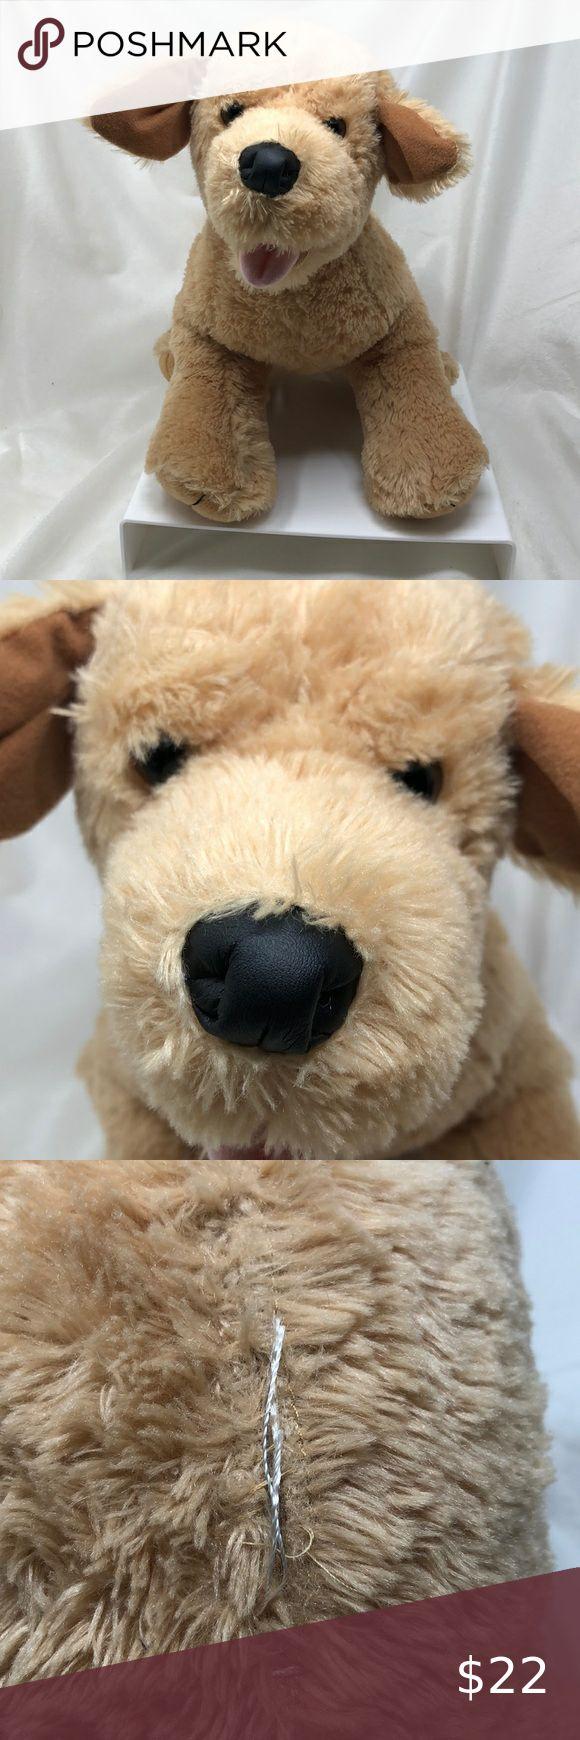 Babw Dog Yellow Lab Golden Retriever Plush Puppy Build A Bear Workshop Babw Yellow Lab Go Build A Bear Toy Plush Stuffed Animals Happy Birthday Teddy Bear [ 1740 x 580 Pixel ]